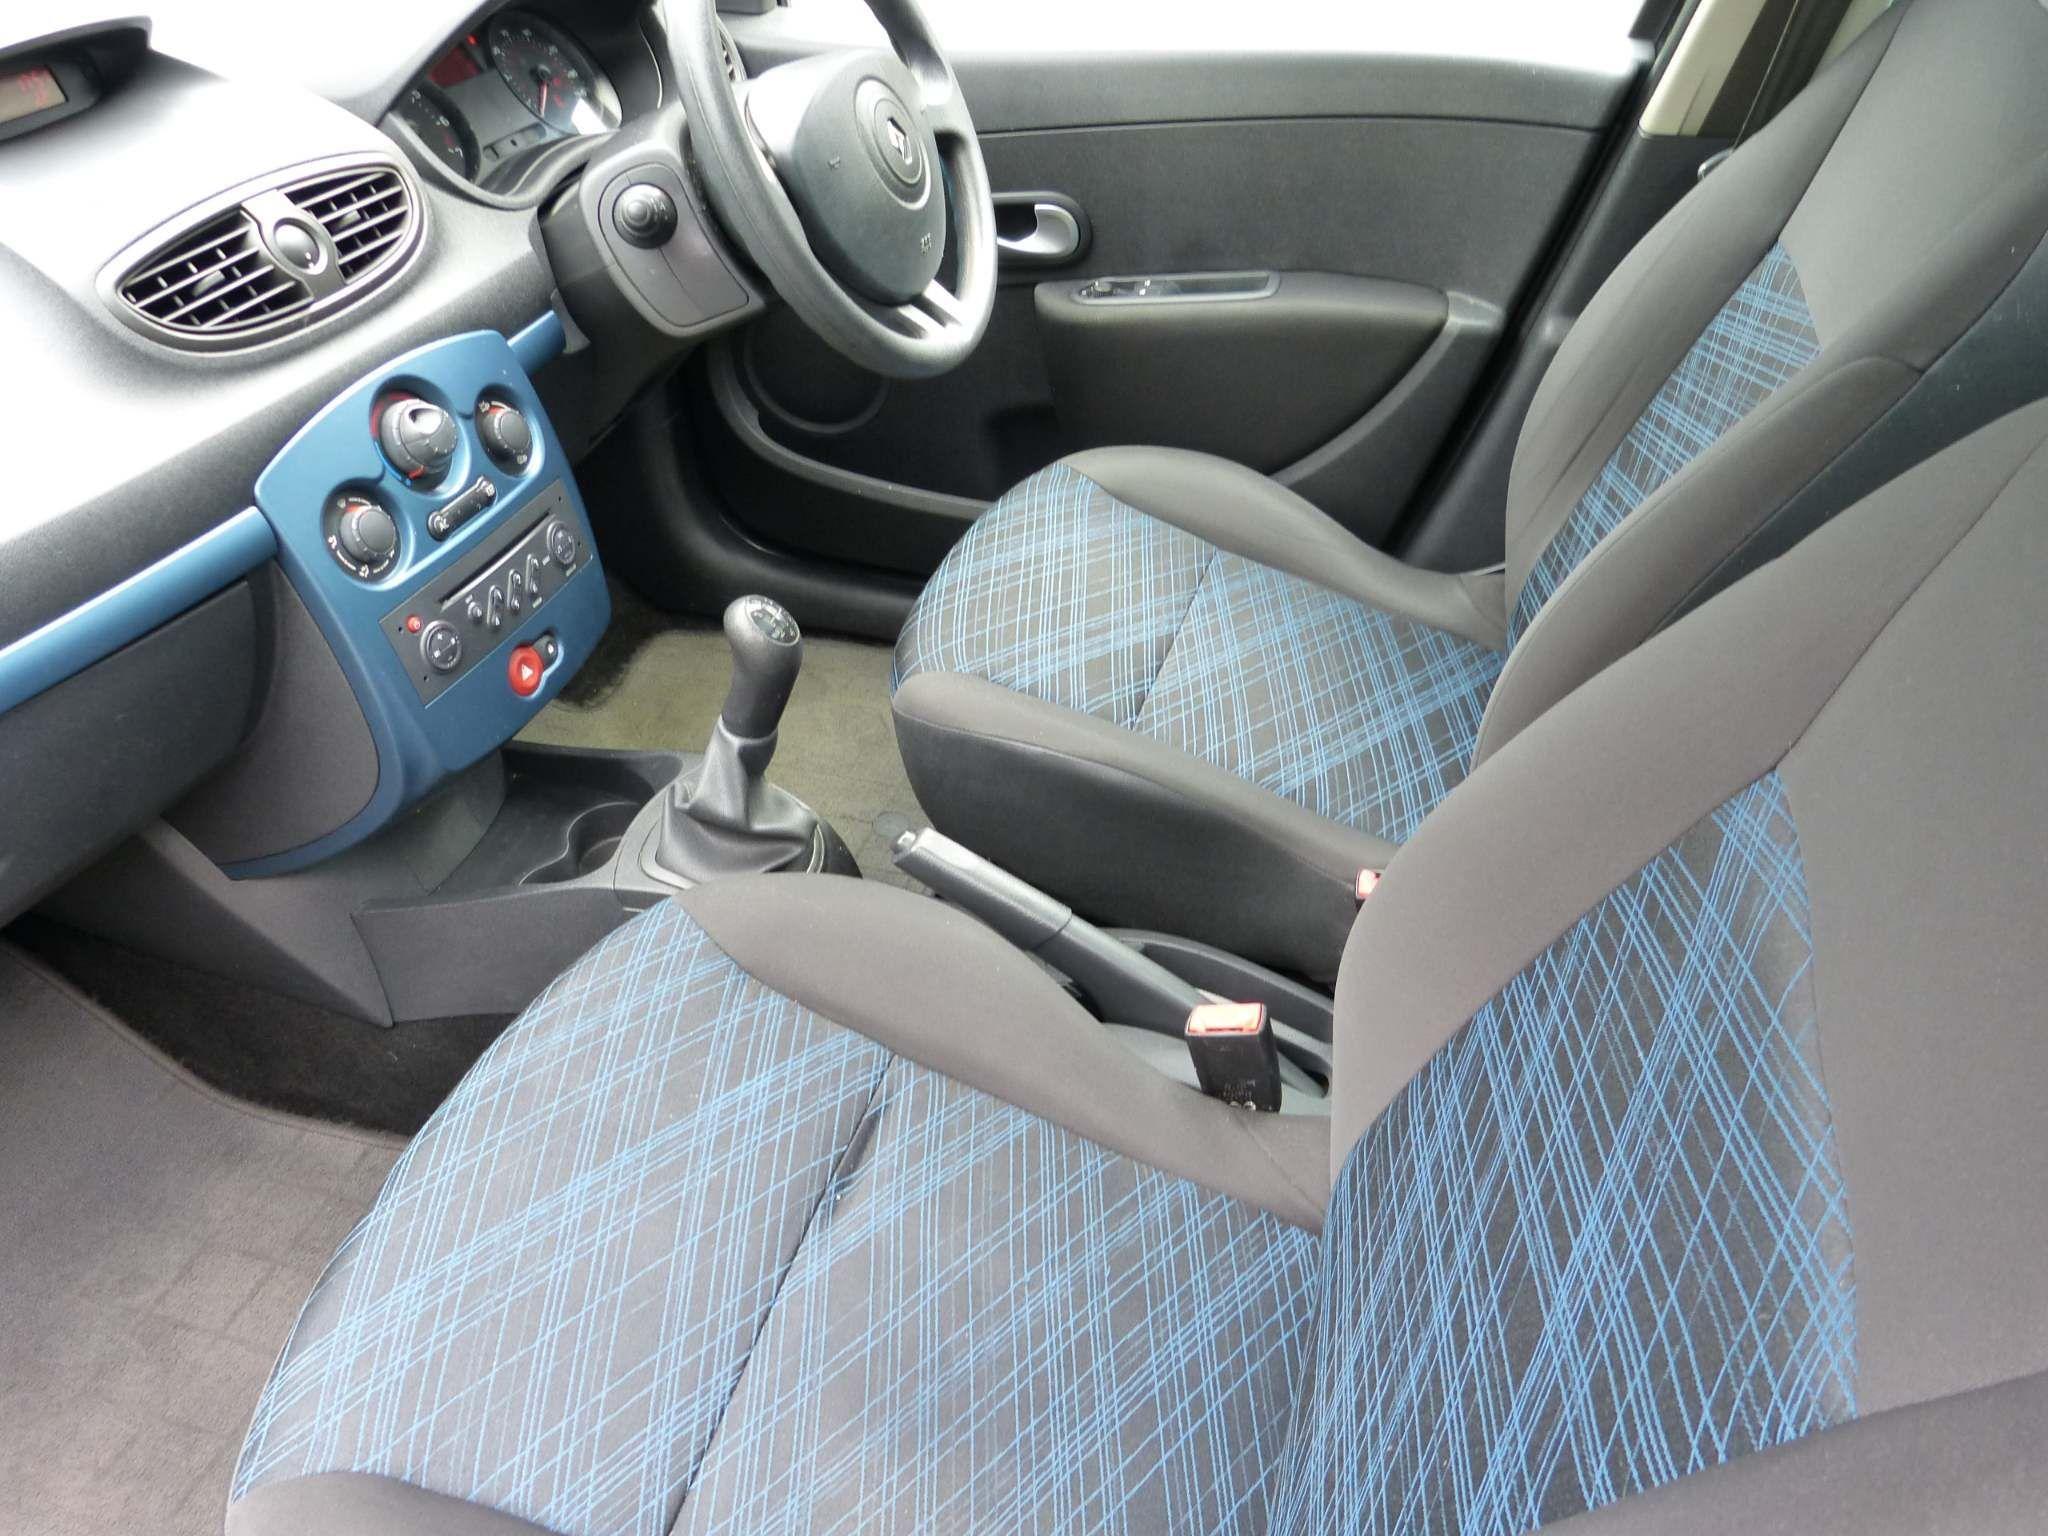 2009 RENAULT Clio 1.2 16v Expression Sport Tourer Petrol Manual  – Beechlawn Motors Belfast full